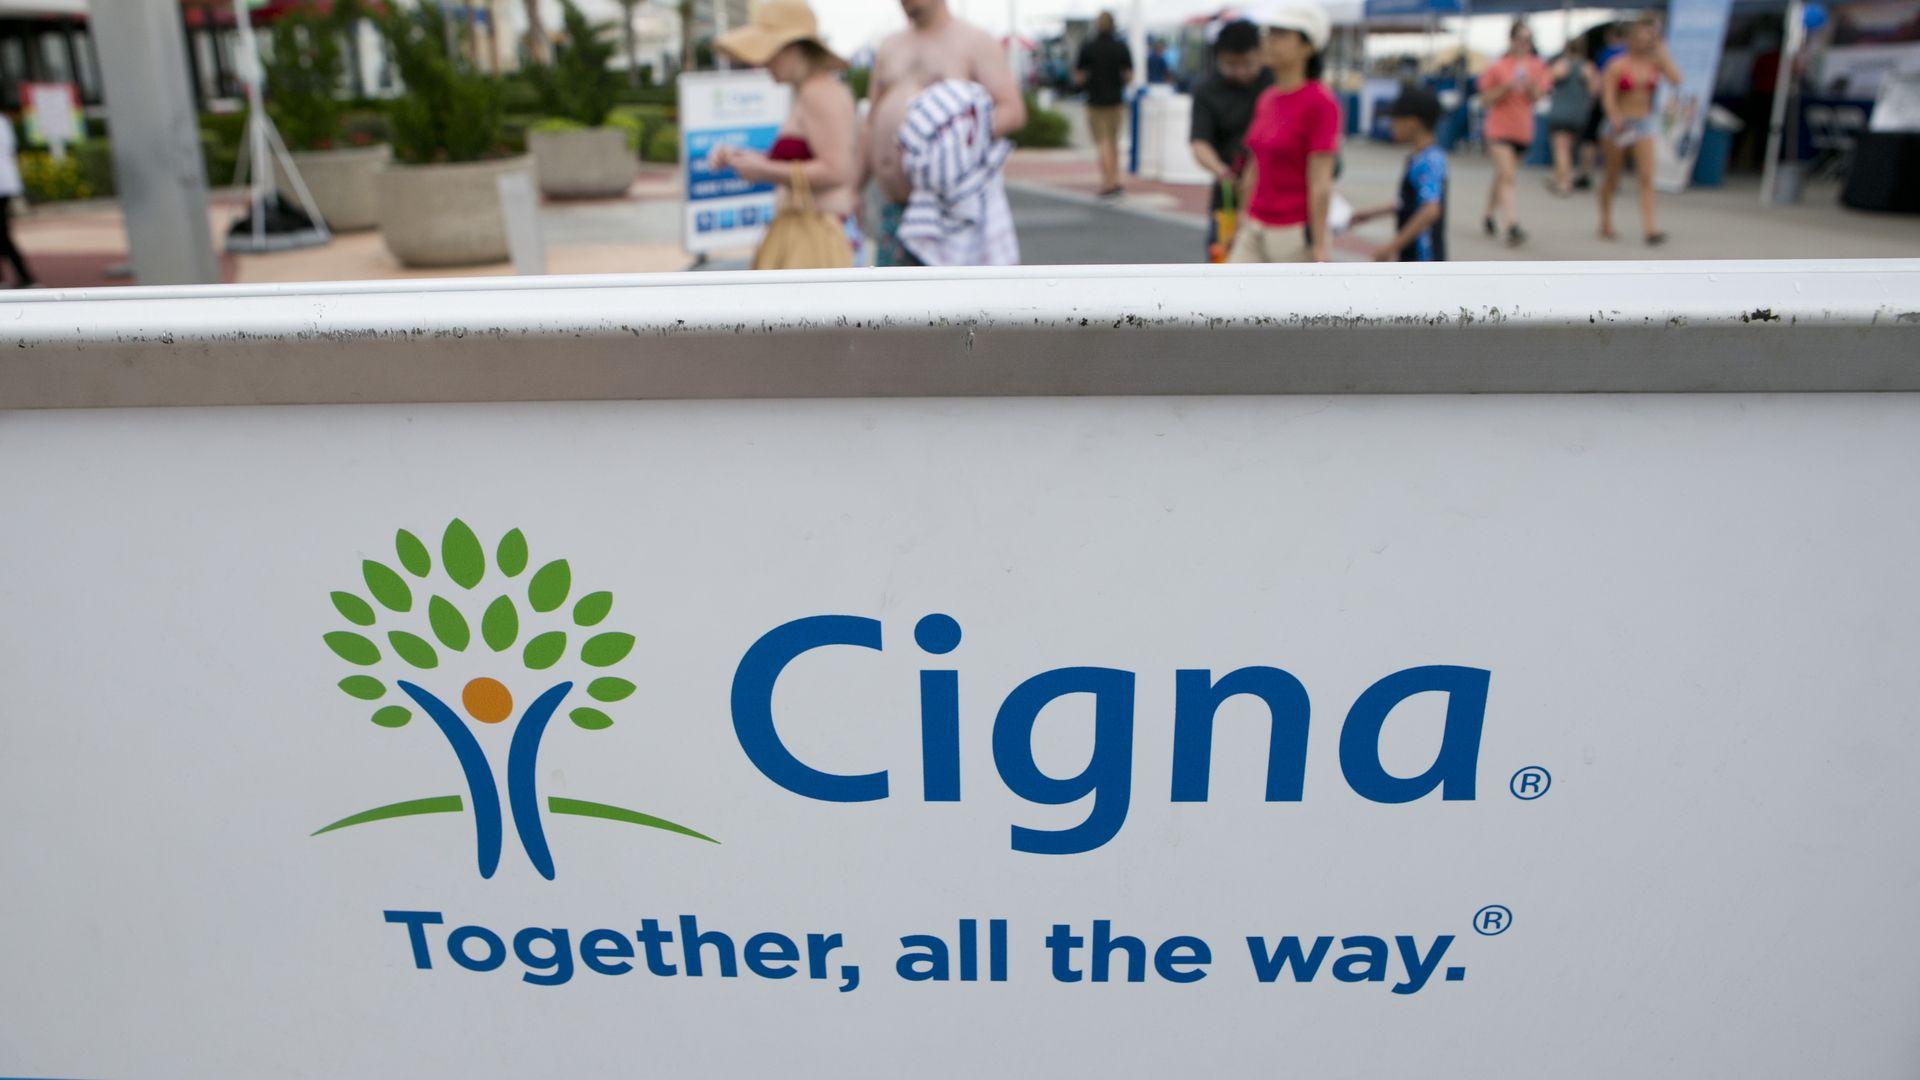 Cigna's logo on a wall.